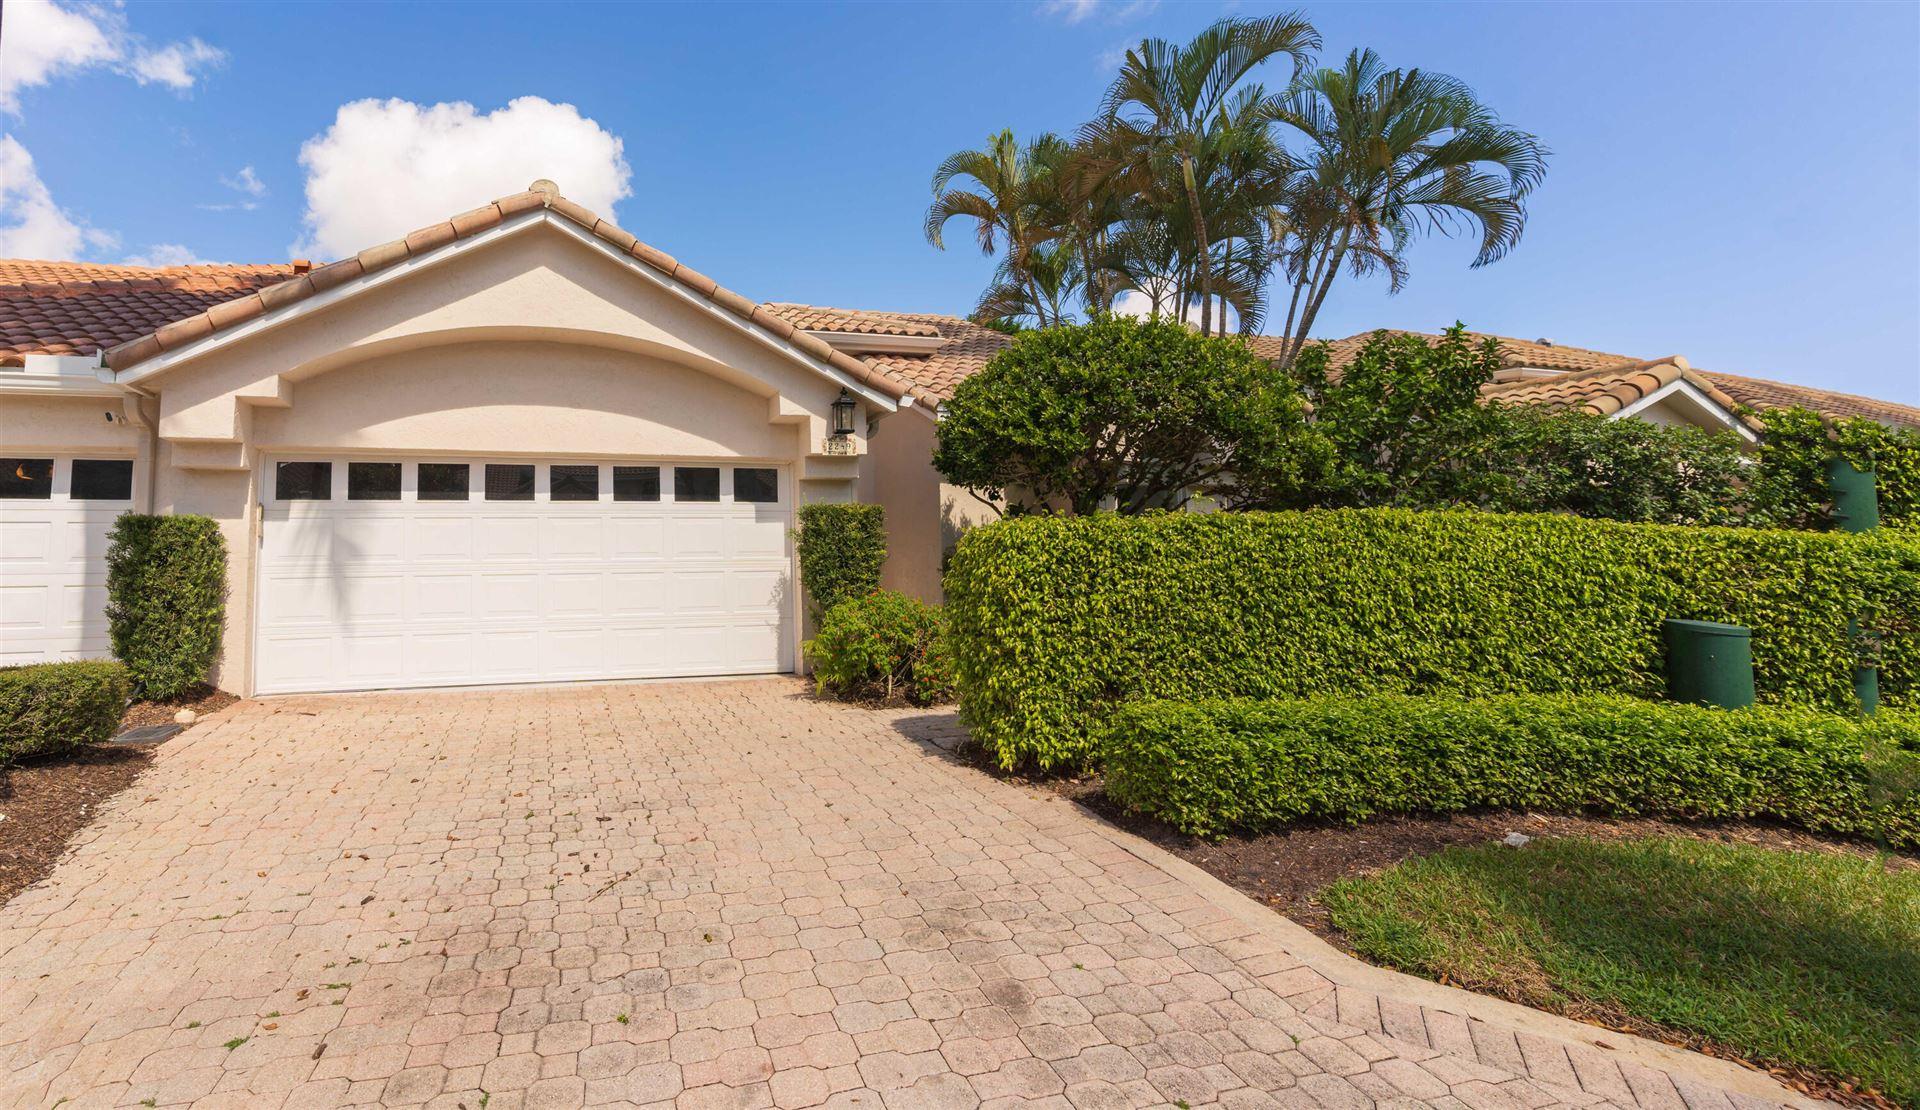 2249 NW 62nd  Drive Drive, Boca Raton, FL 33496 - MLS#: RX-10748232